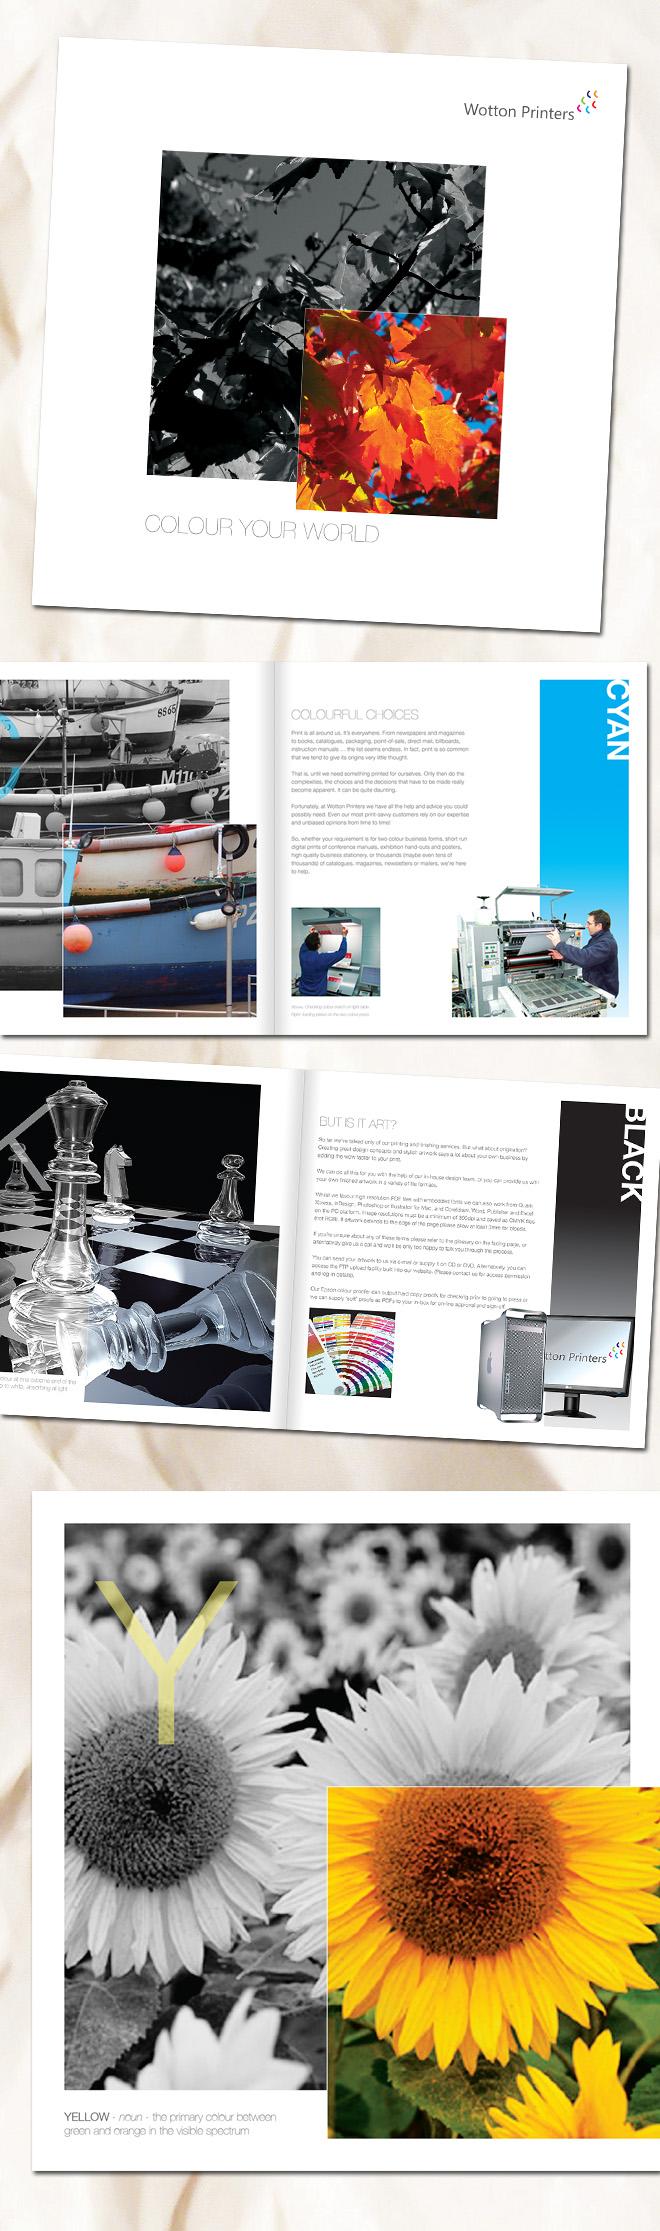 Wotton Printers Brochure Design